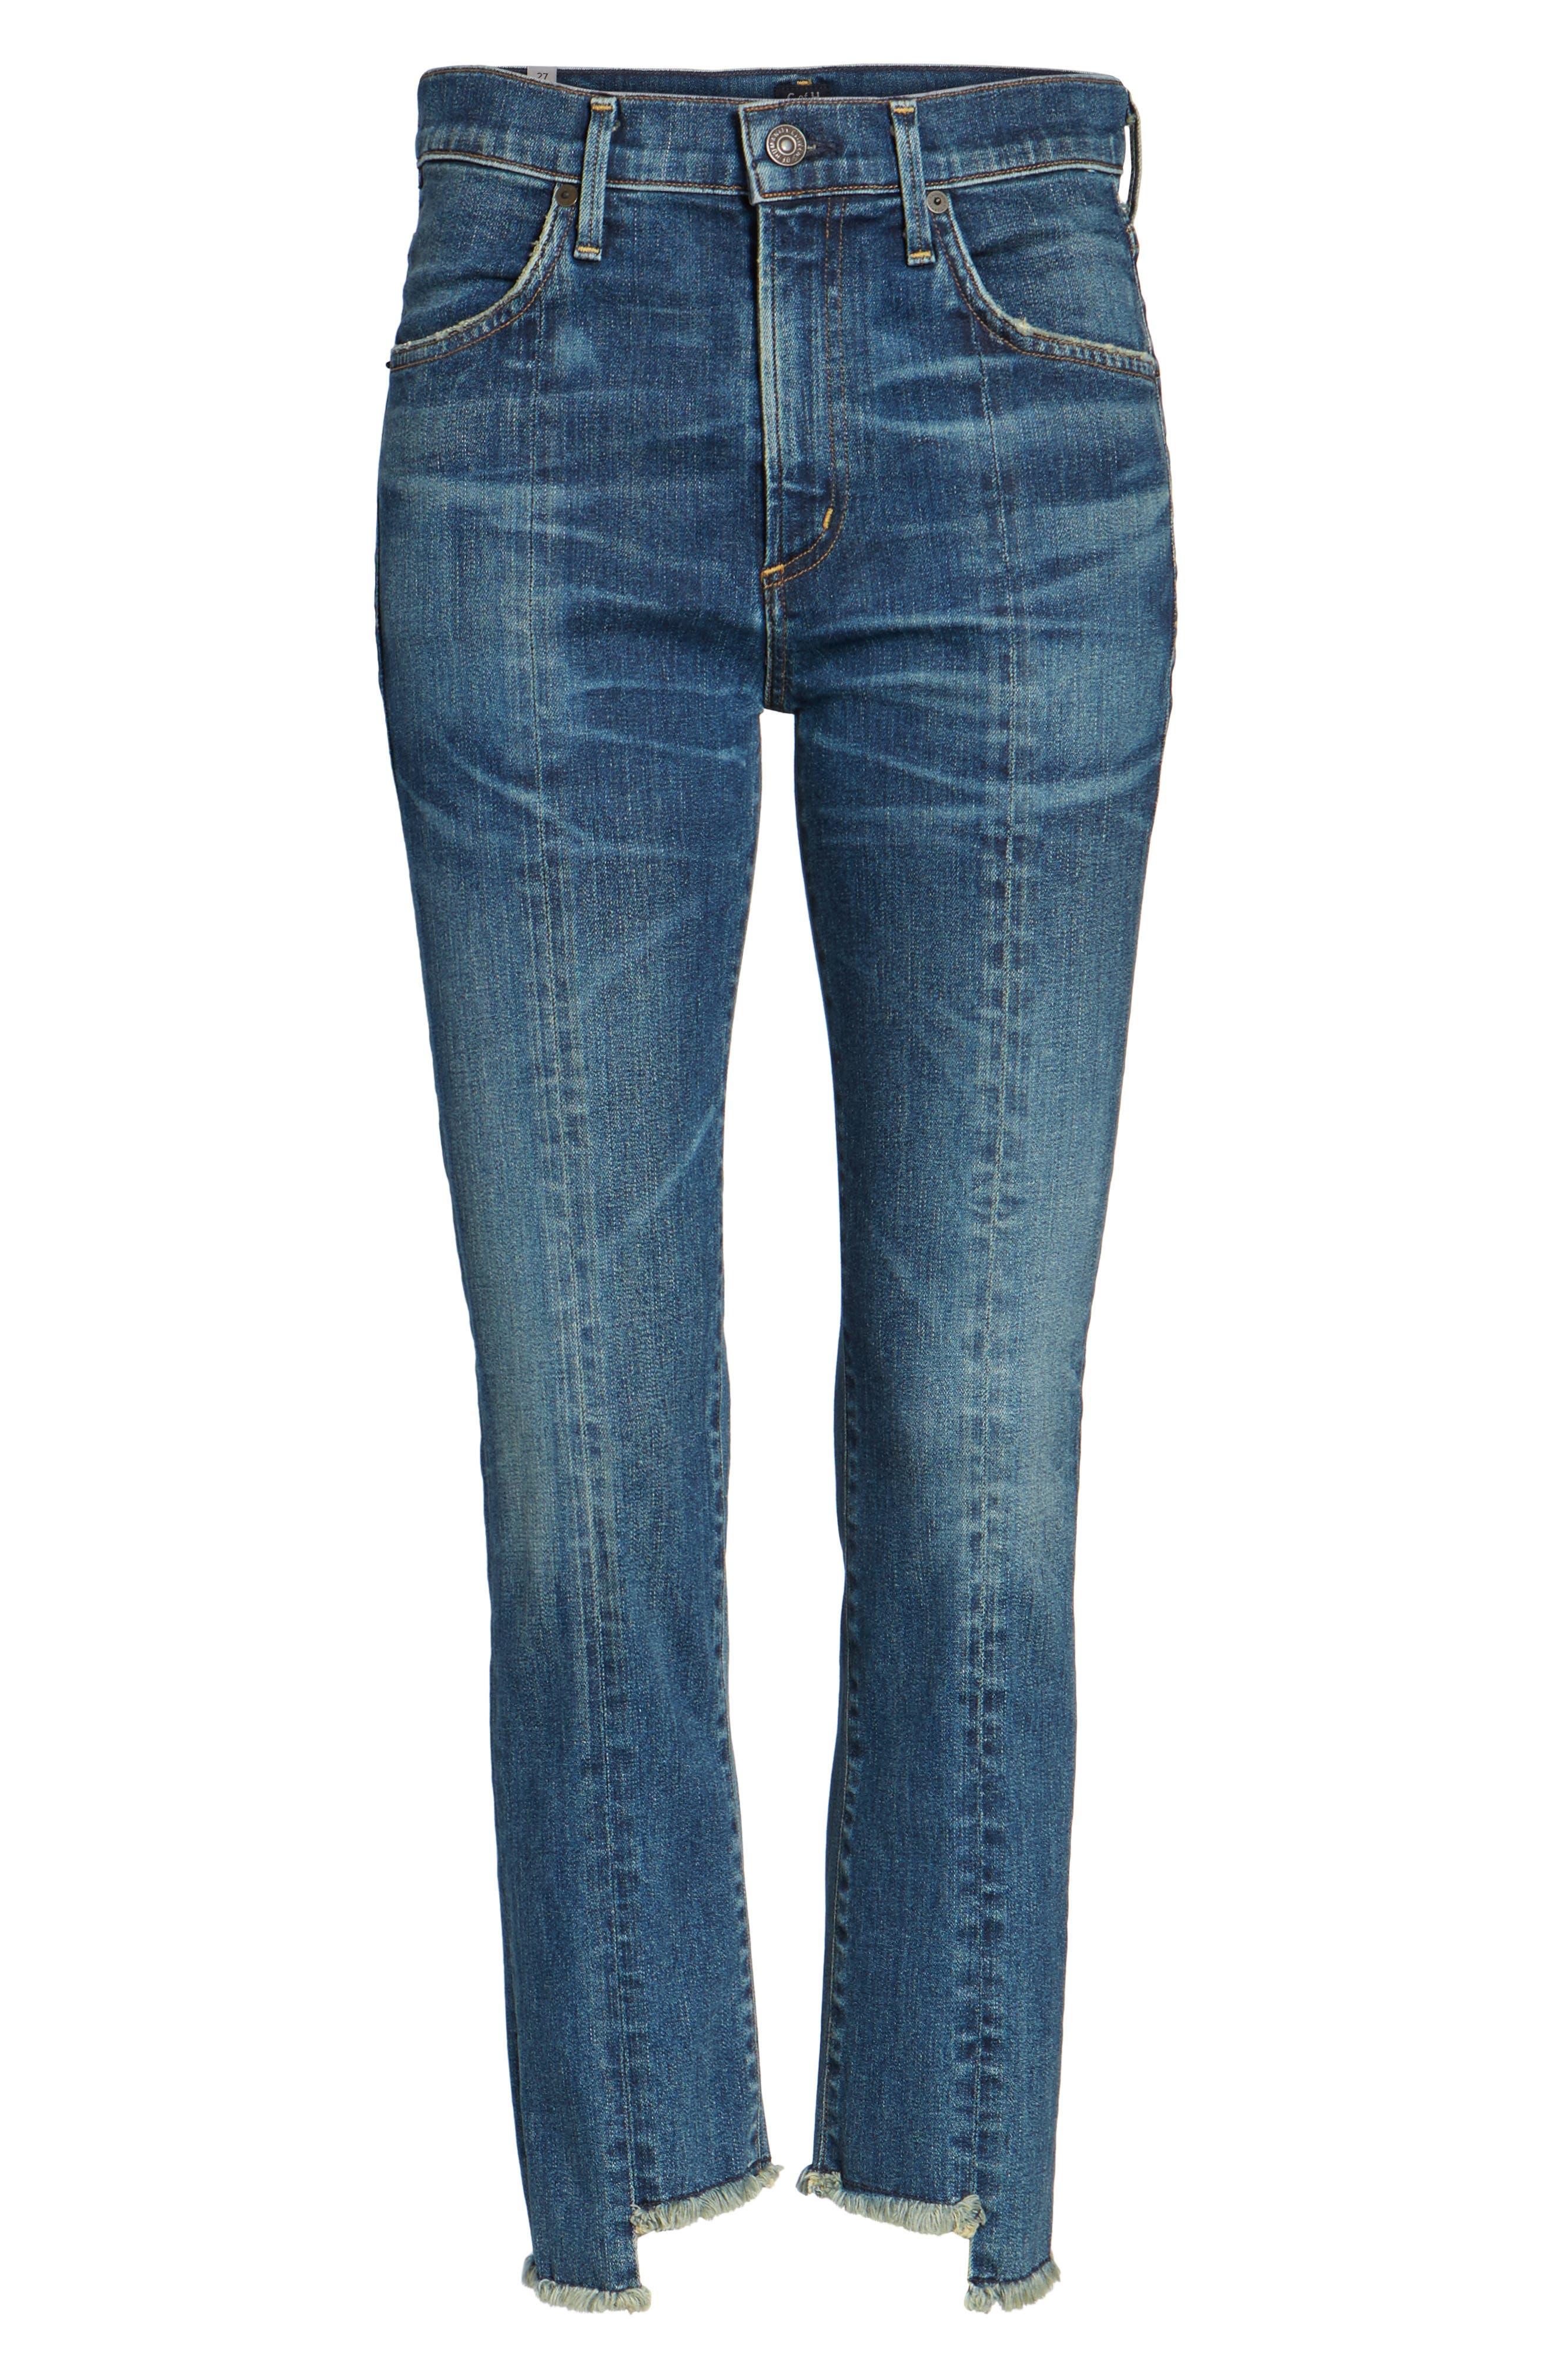 Amari Step Hem Ankle Jeans,                             Alternate thumbnail 6, color,                             429